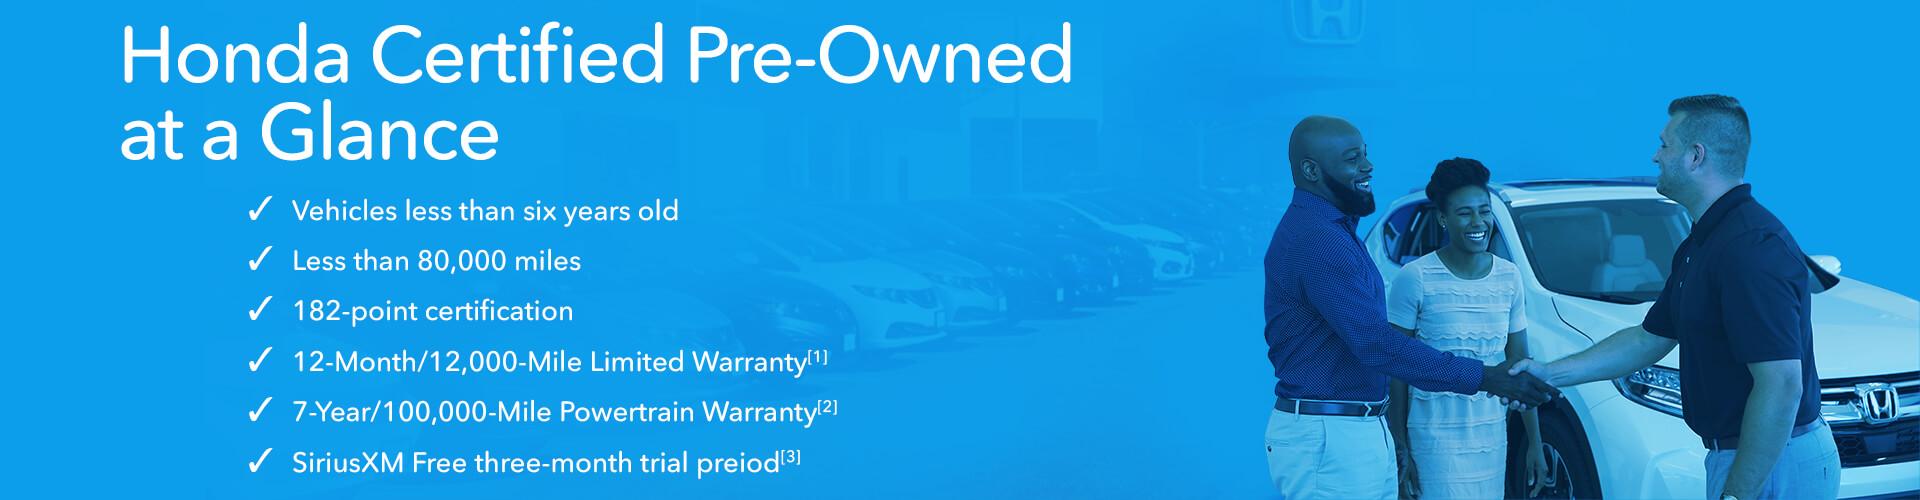 Honda Certified Pre Owned Warranty >> Honda Certified Pre Owned Coachella Valley Honda Dealers